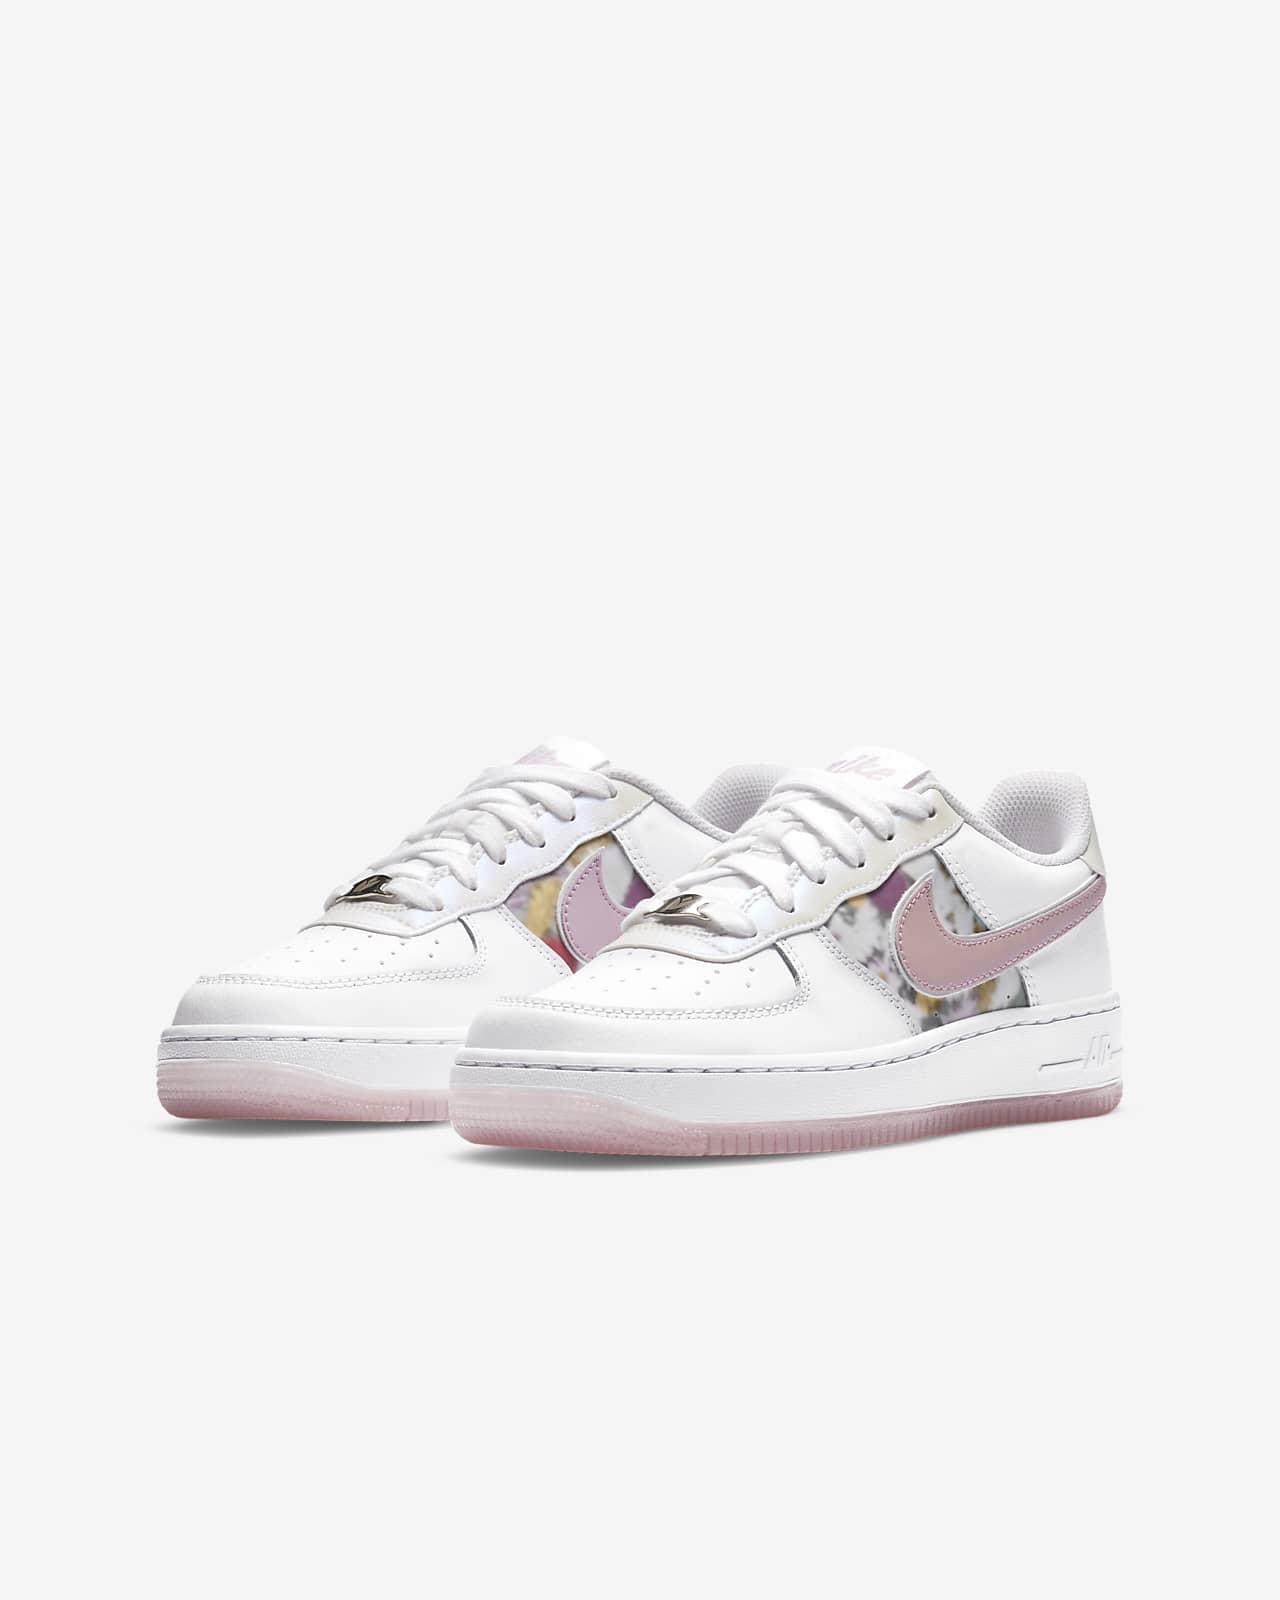 Nike Air Force 1 Older Kids' Shoe. Nike SG